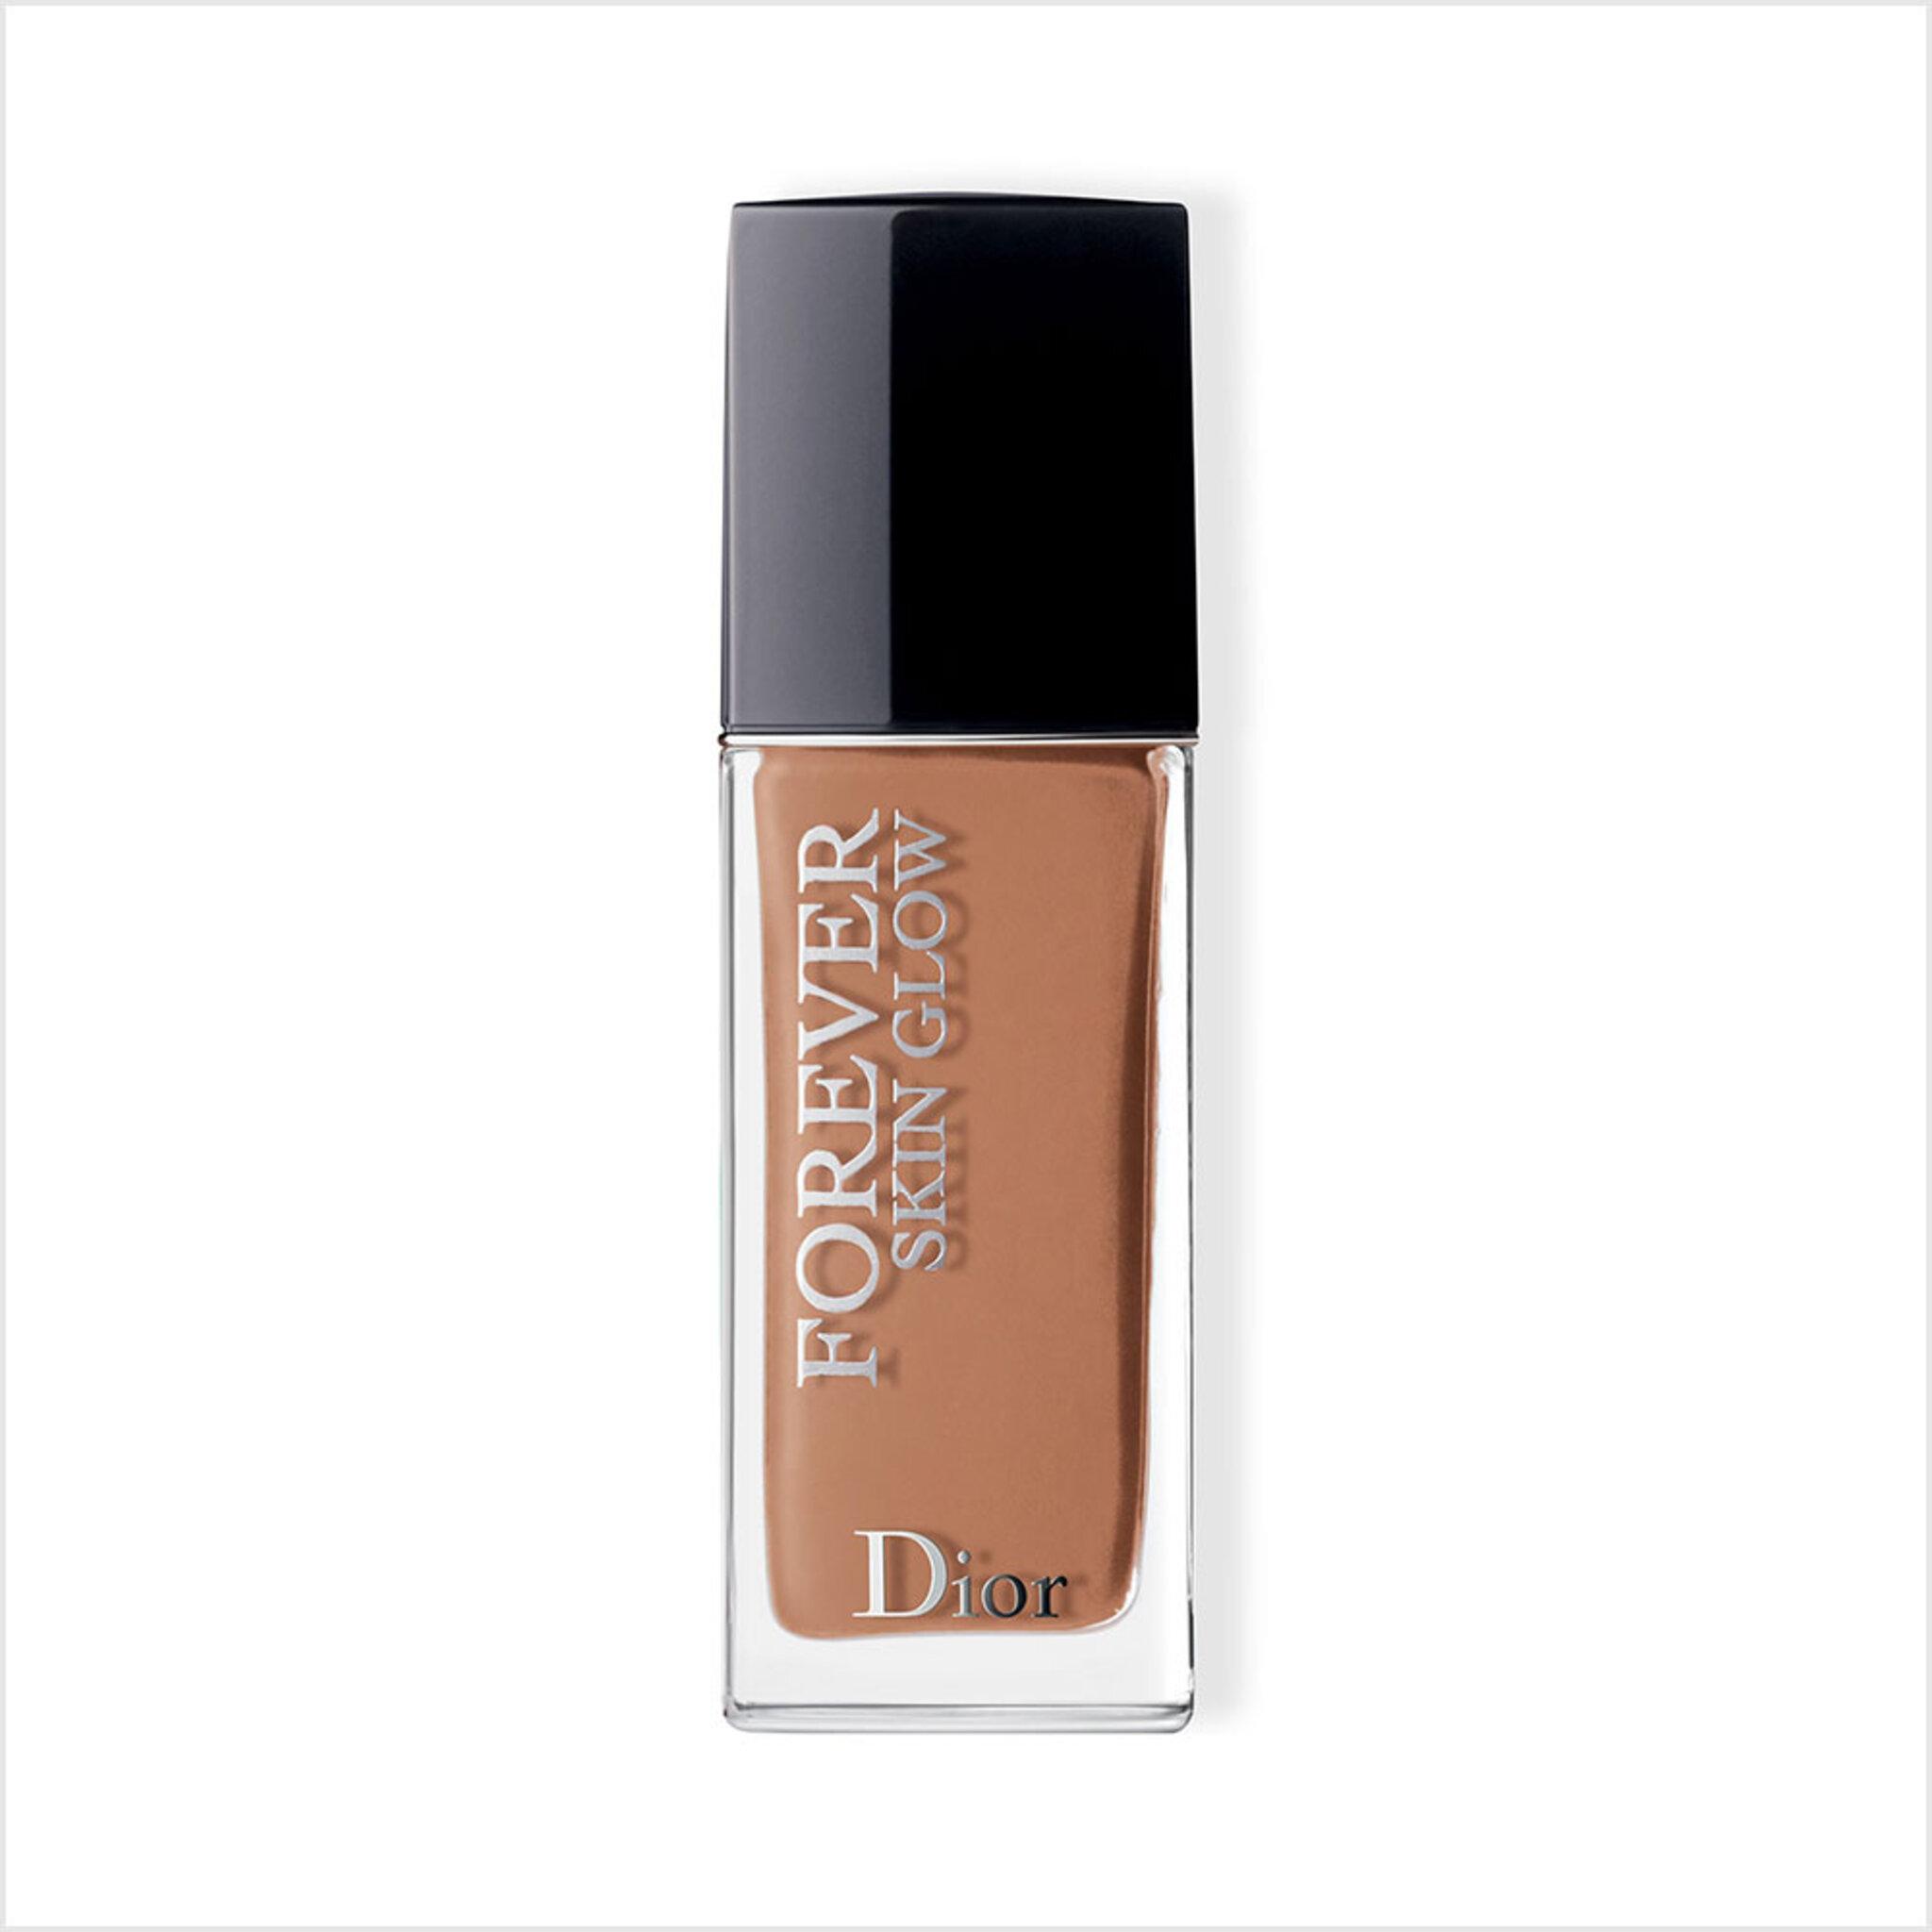 Diorskin Forever Fluid Skin Glow Foundation